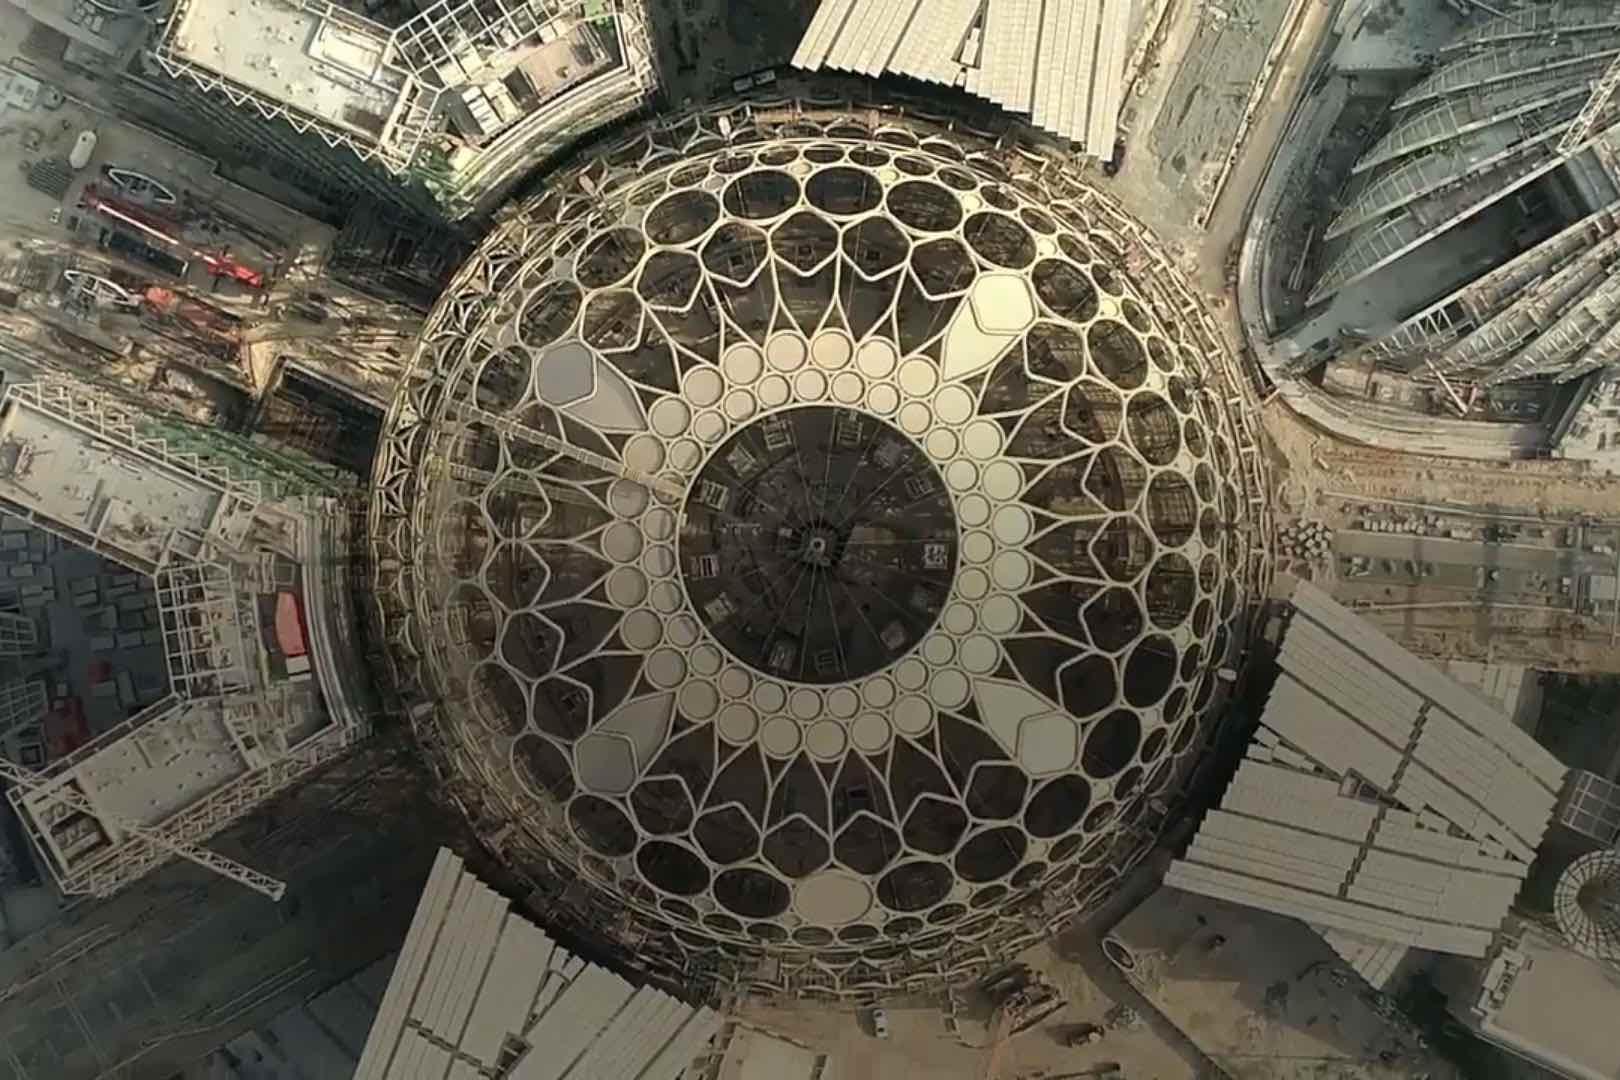 Expo 2021 Dubai - Construction site of the central dome